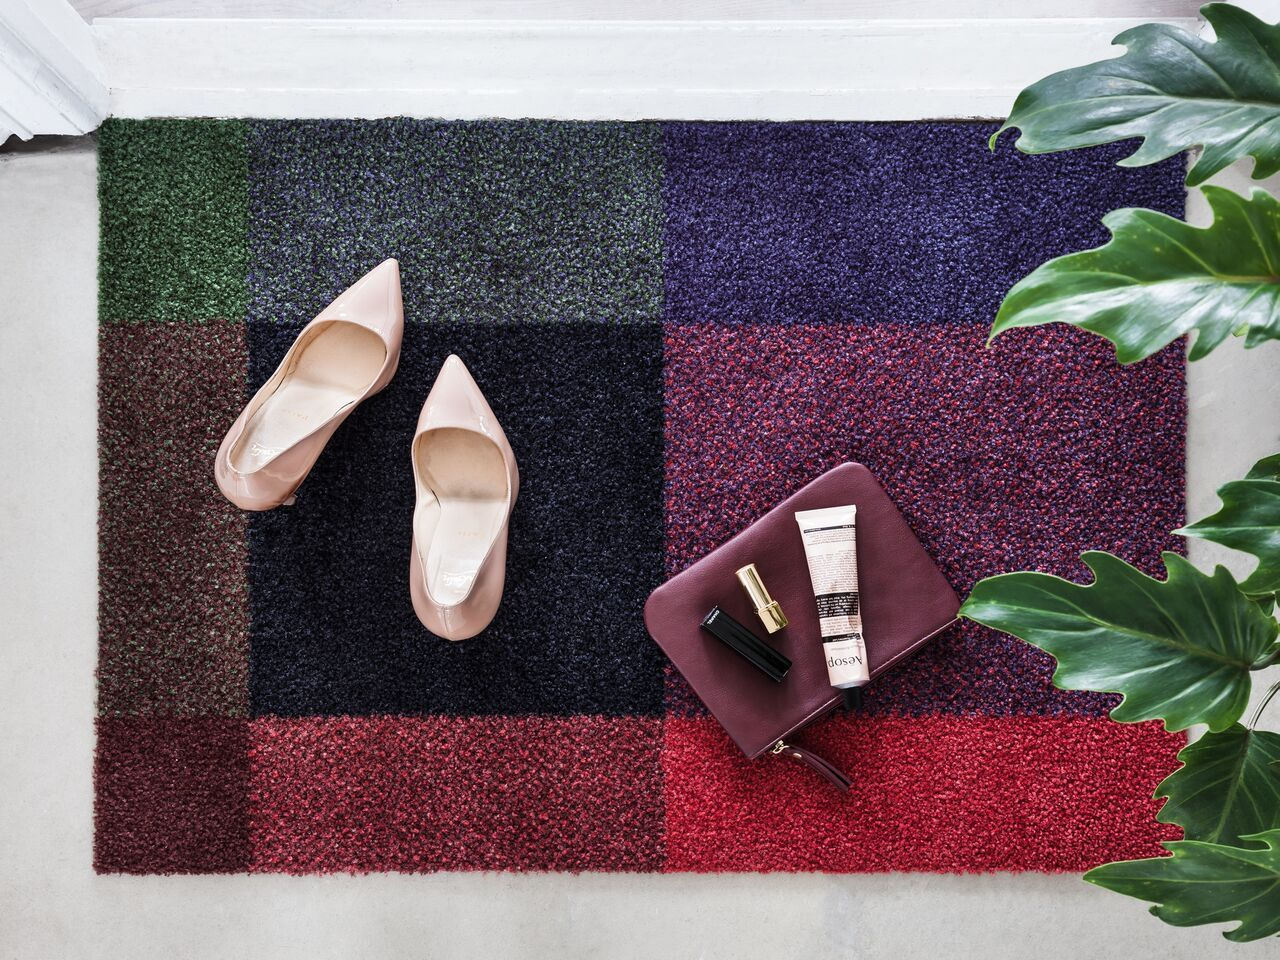 Doormats from Heymat and Norwegian designer Kristine Five Melvær.